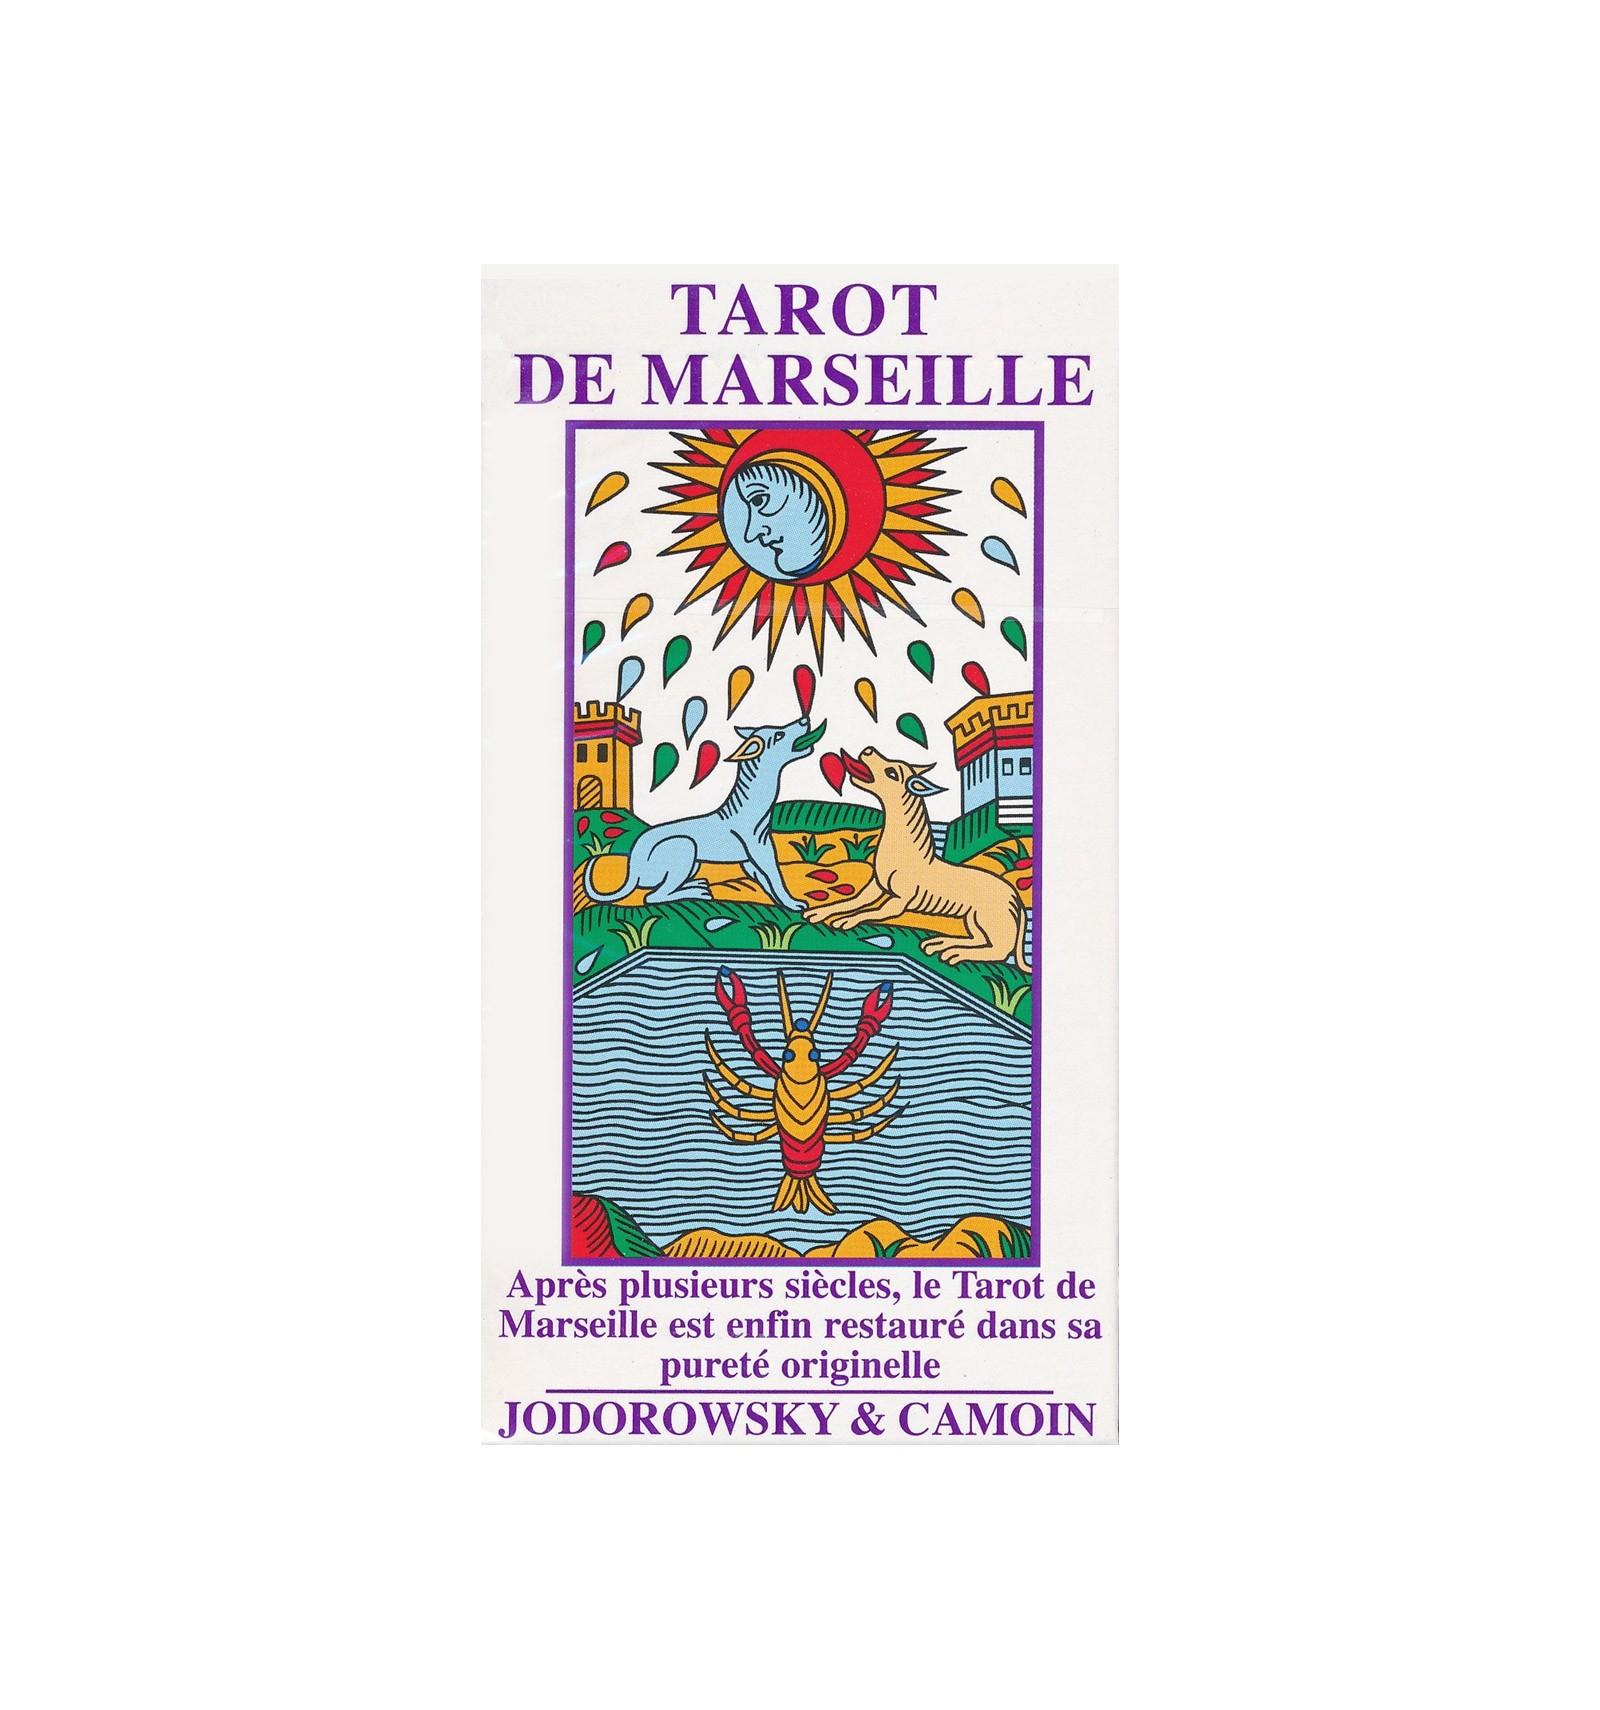 d6835f6e49baf3 Tarot de Marseille Jodorowsky   Camoin - Grand format